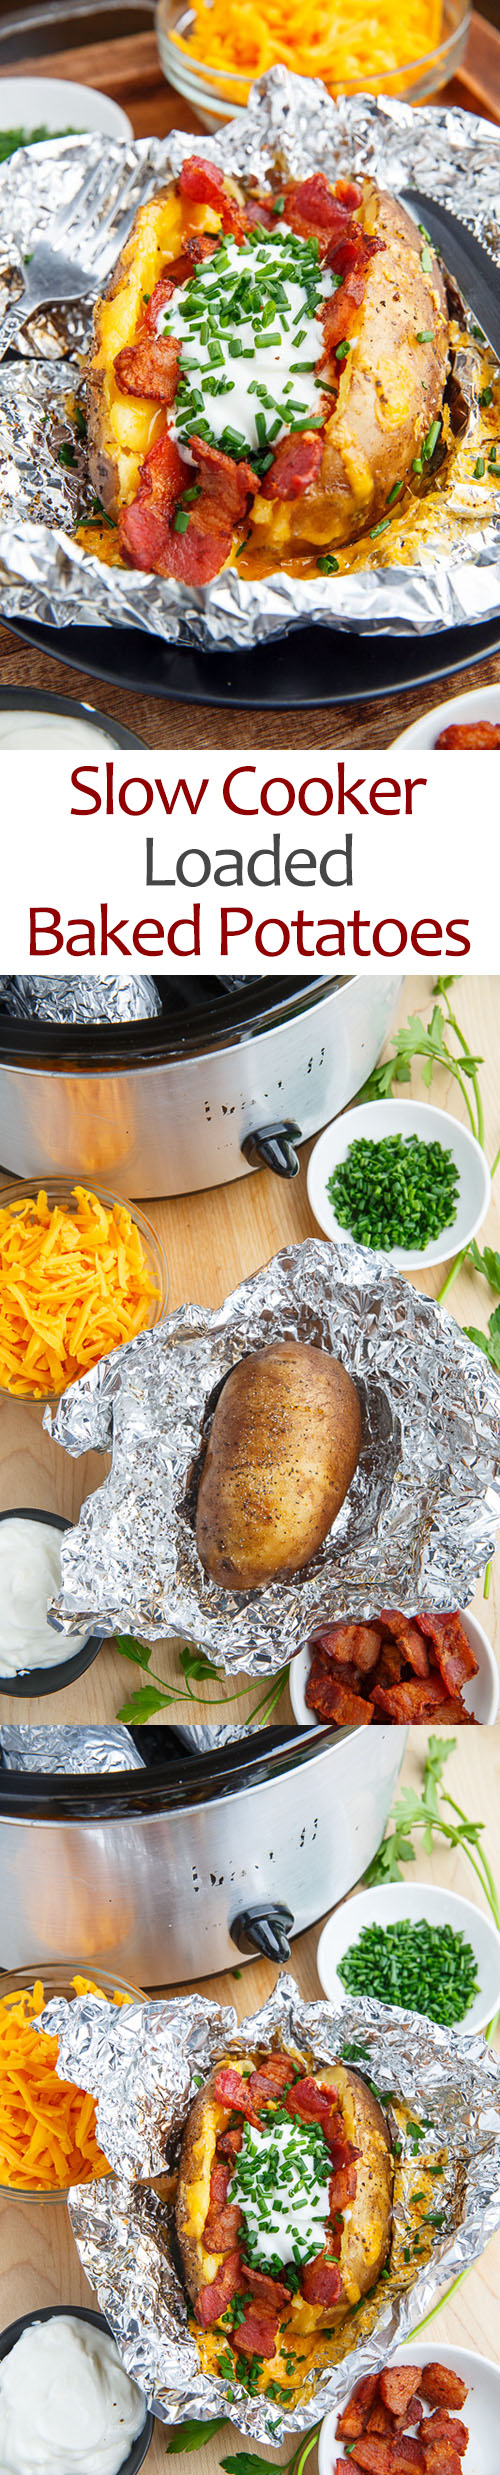 Slow Cooker Loaded Baked Potatoes